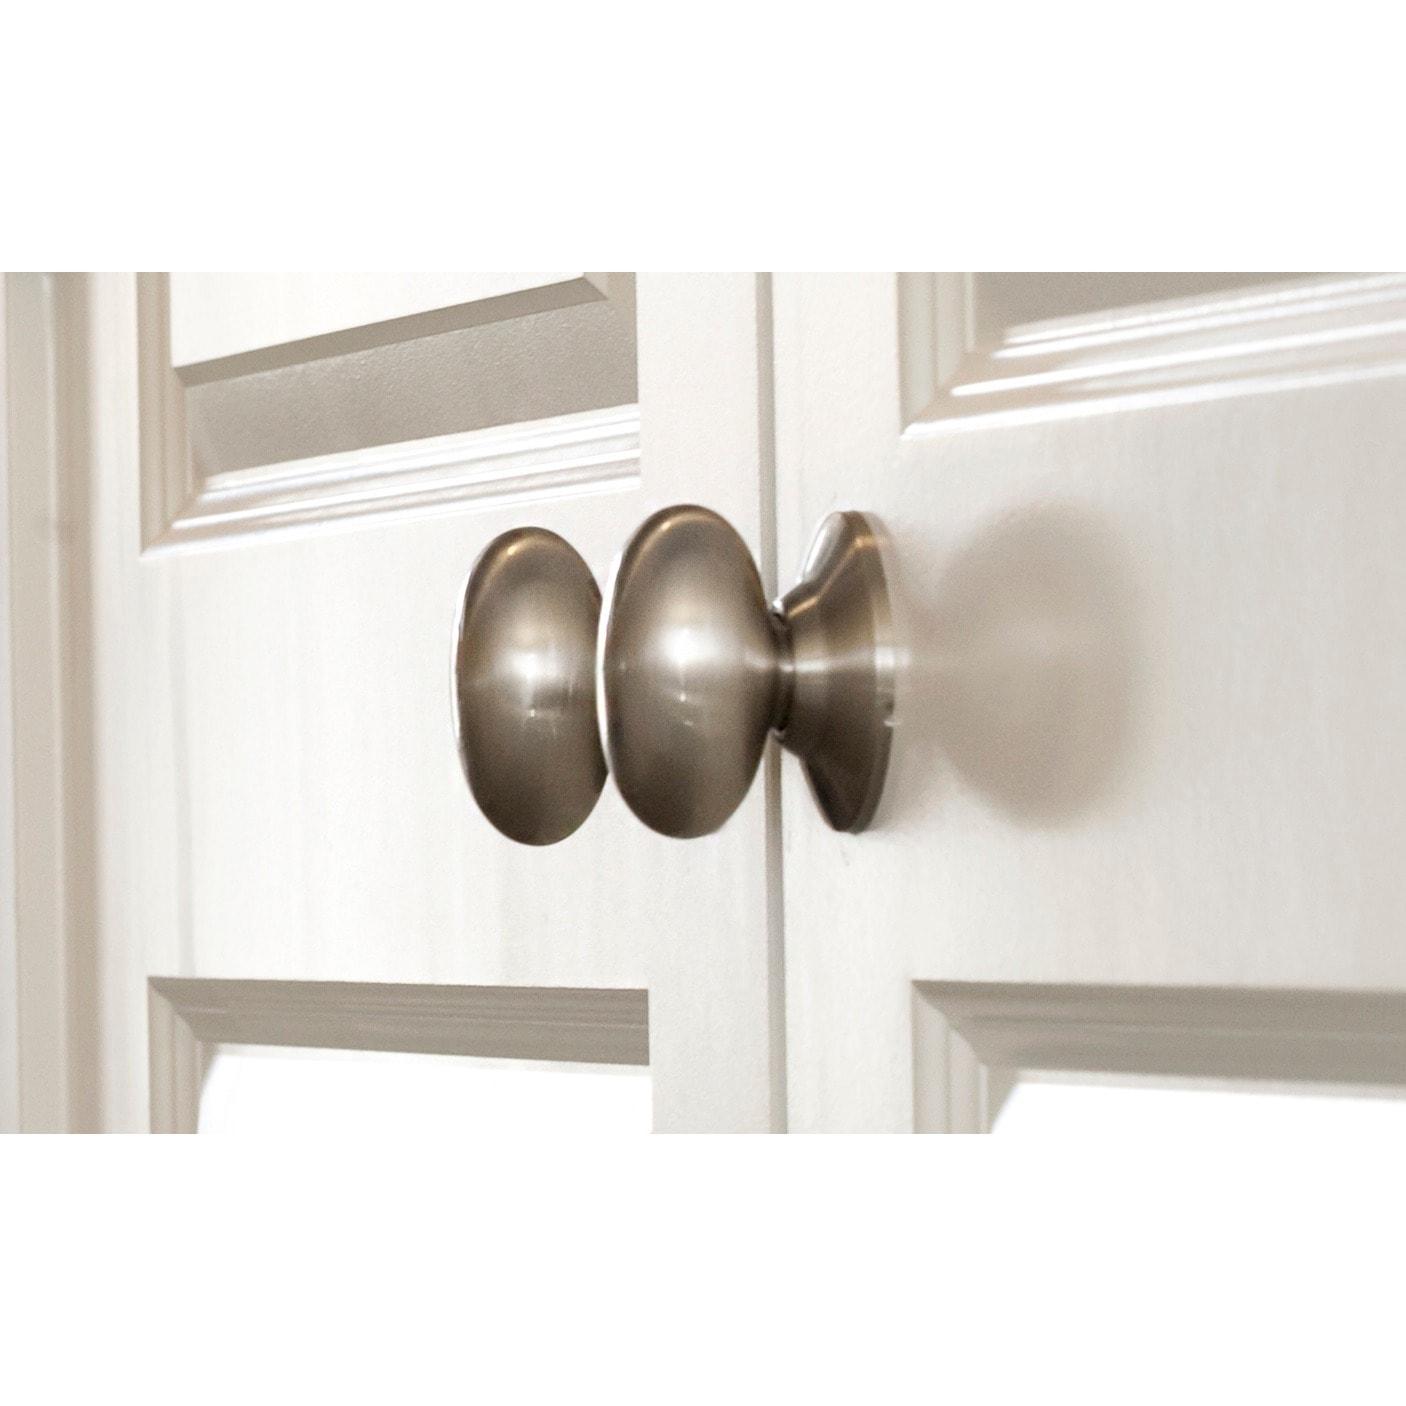 SURE-LOC Egg-Shaped Dummy Door Knob (set of 2) (Antique N...